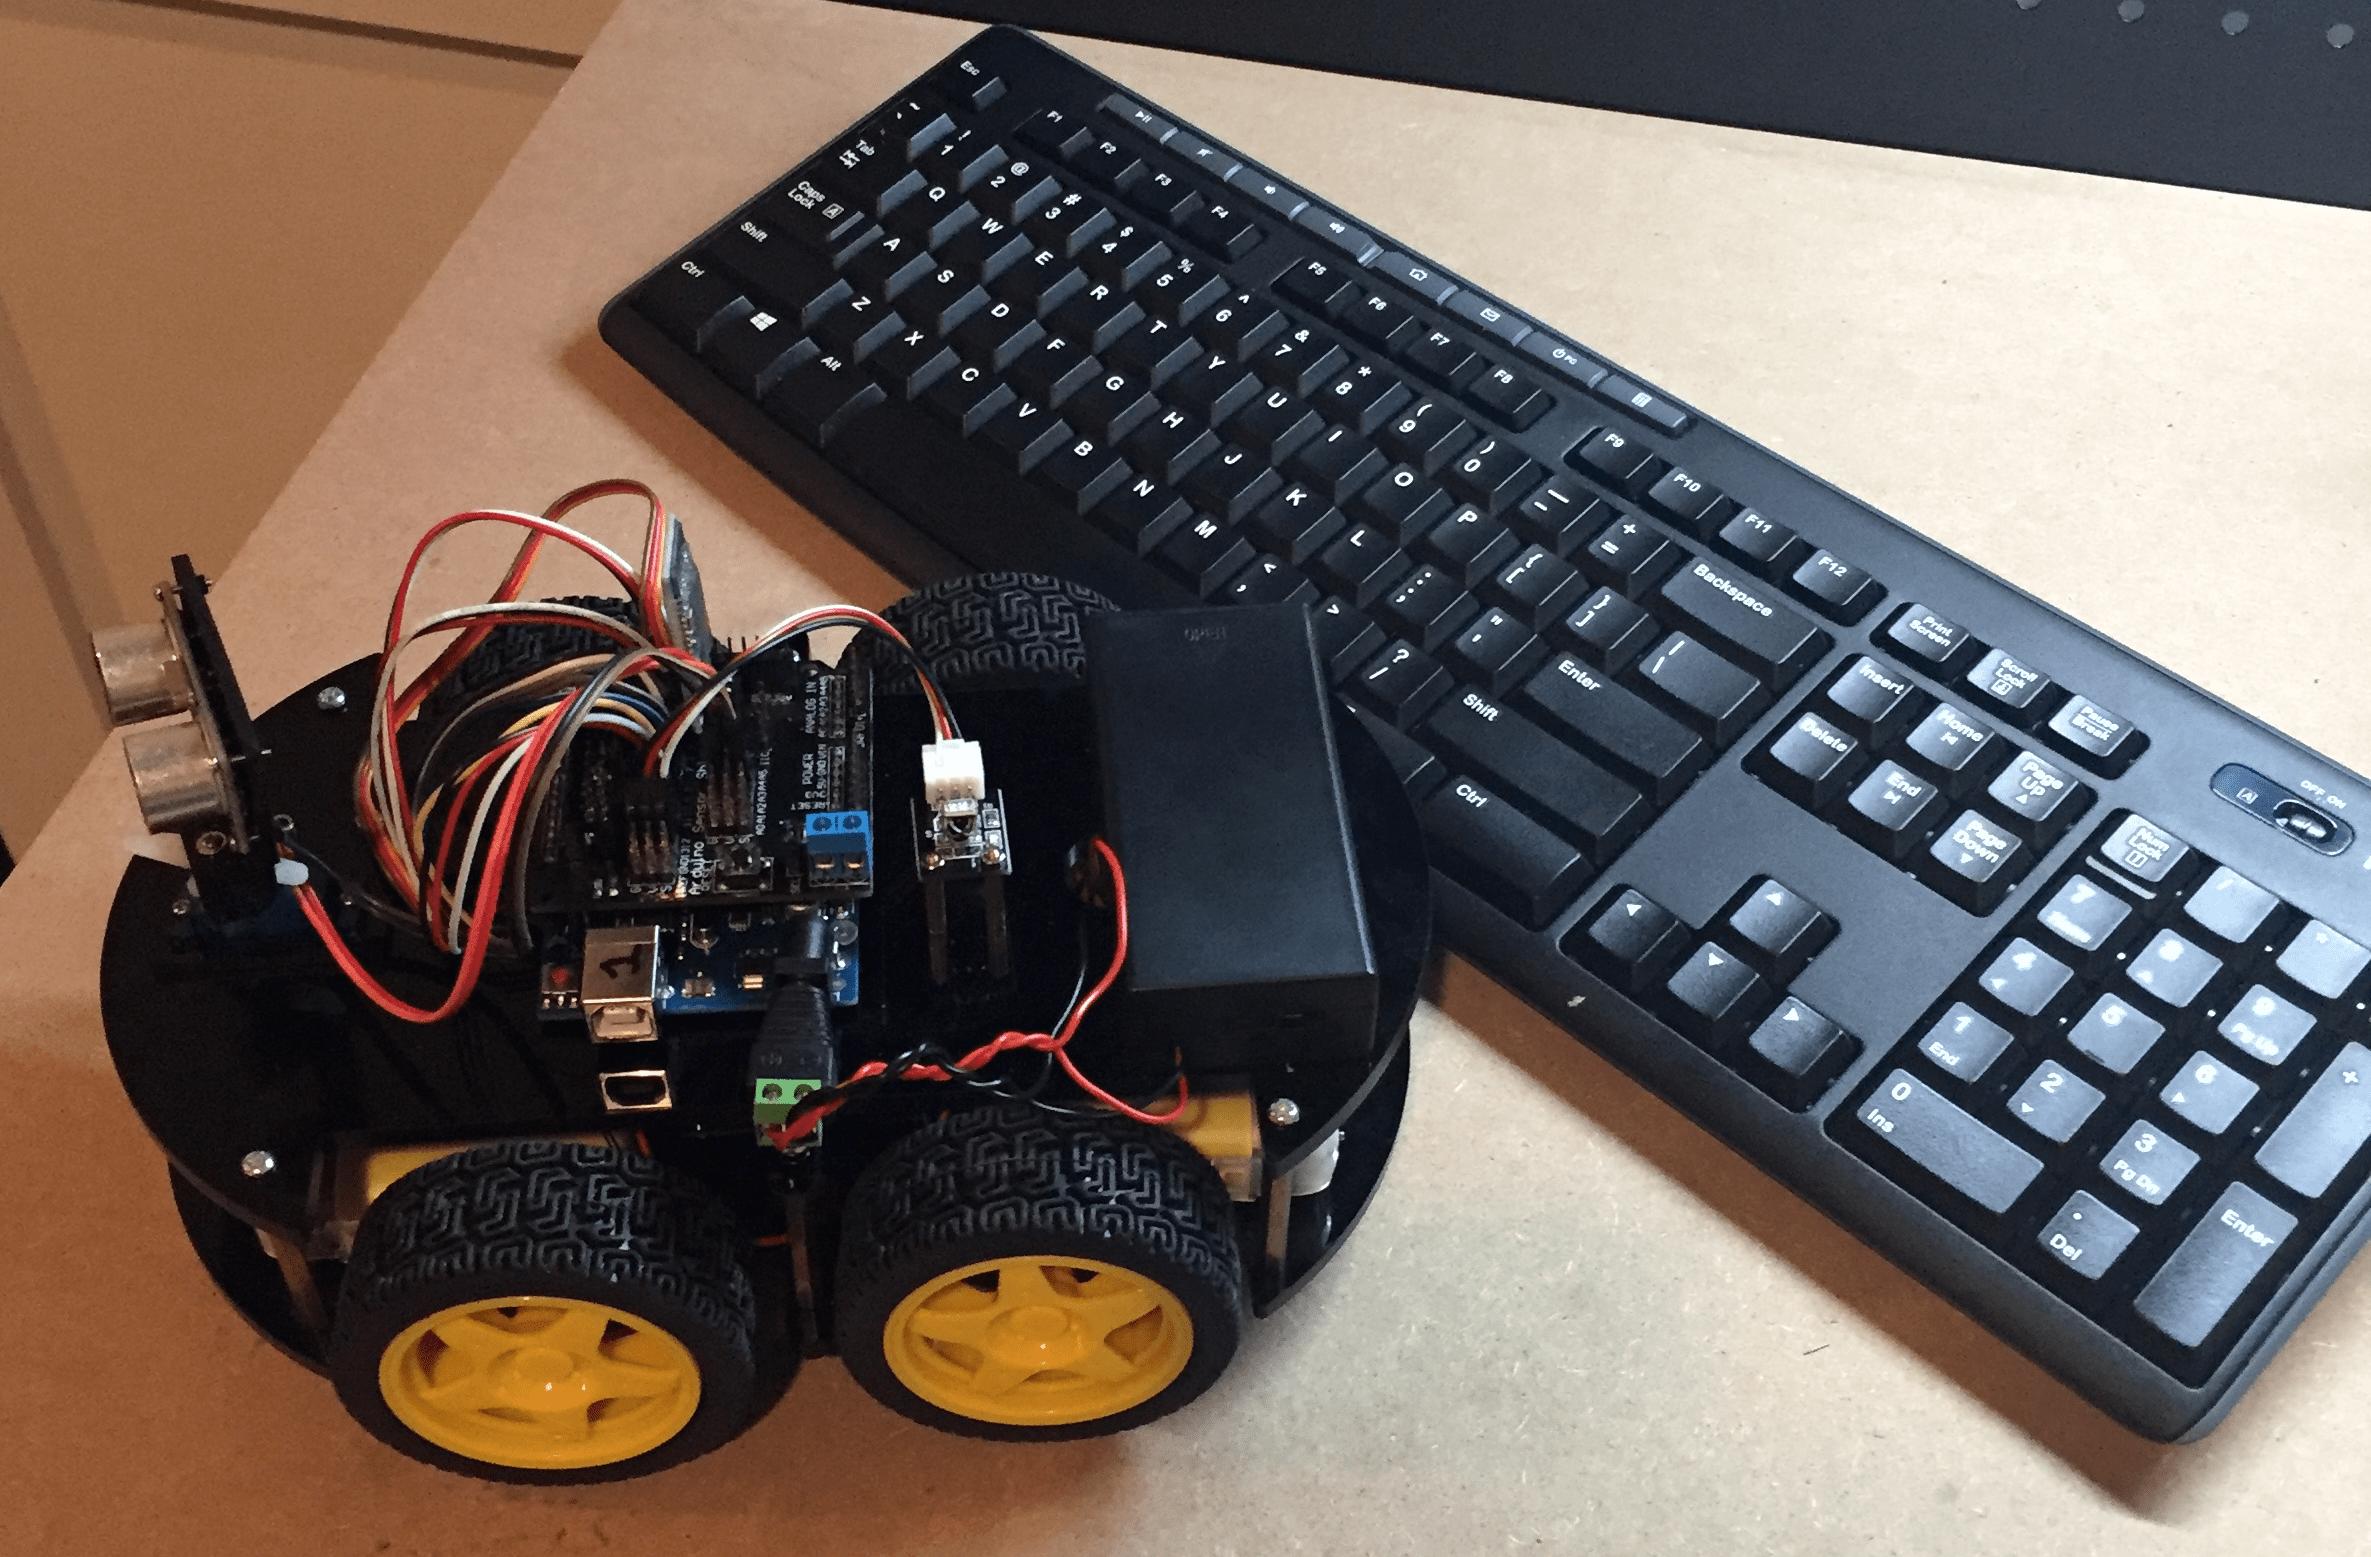 Control an Arduino Robot with a Bluetooth Keyboard